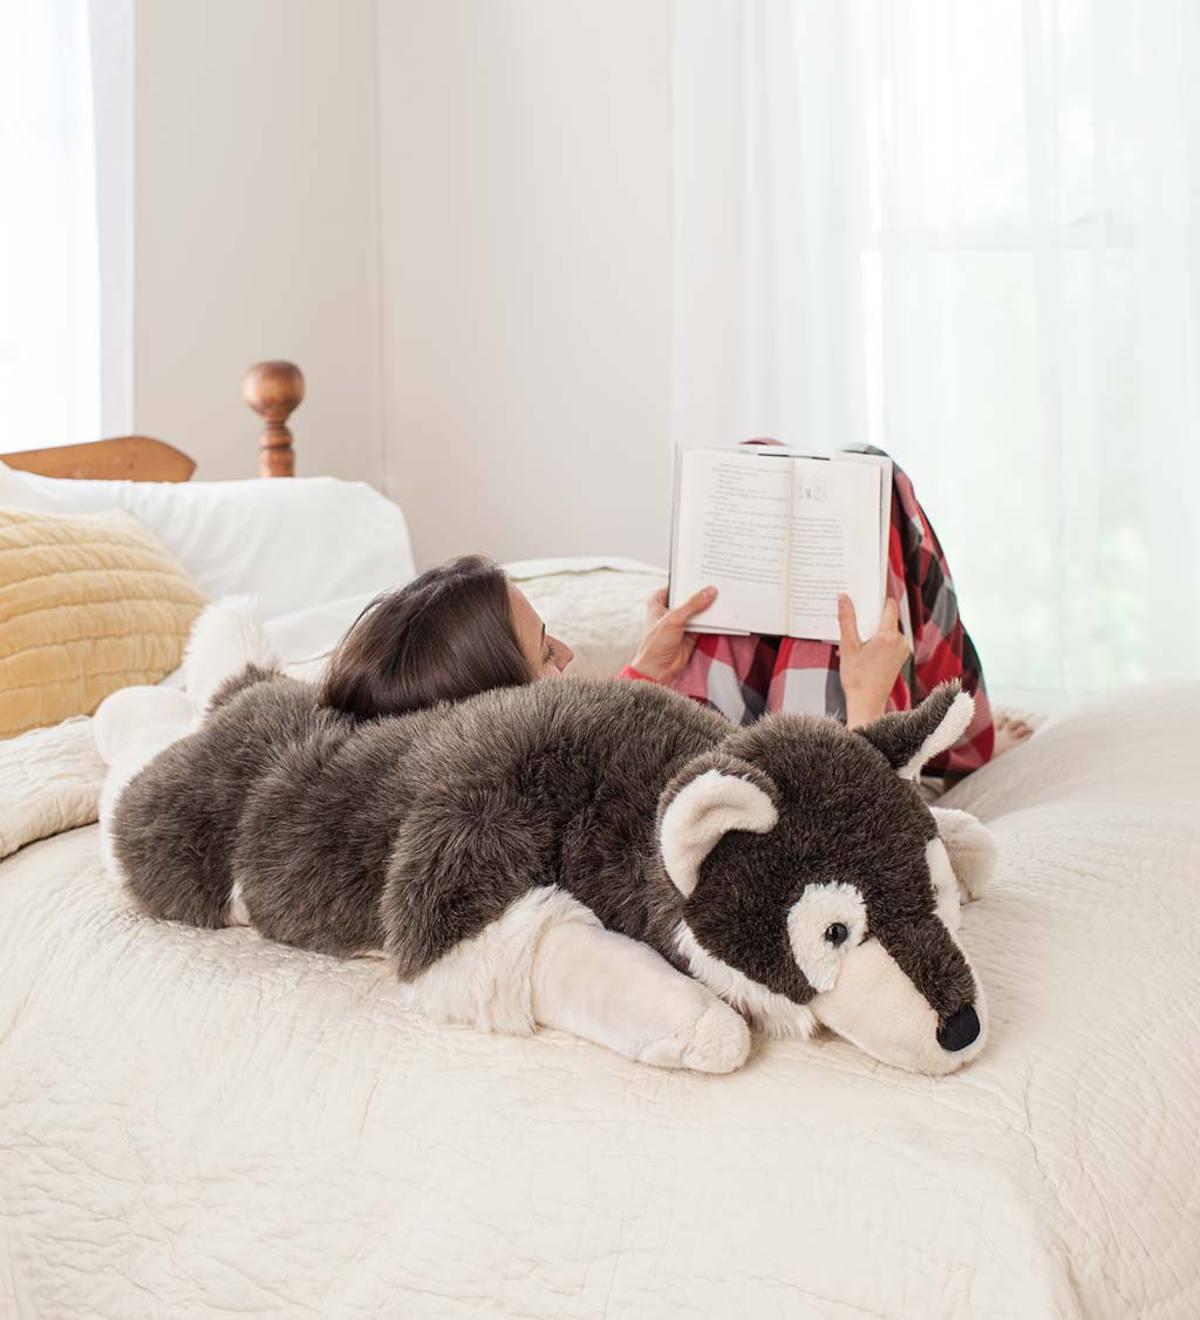 Husky Dog Plush Body Pillow Plowhearth